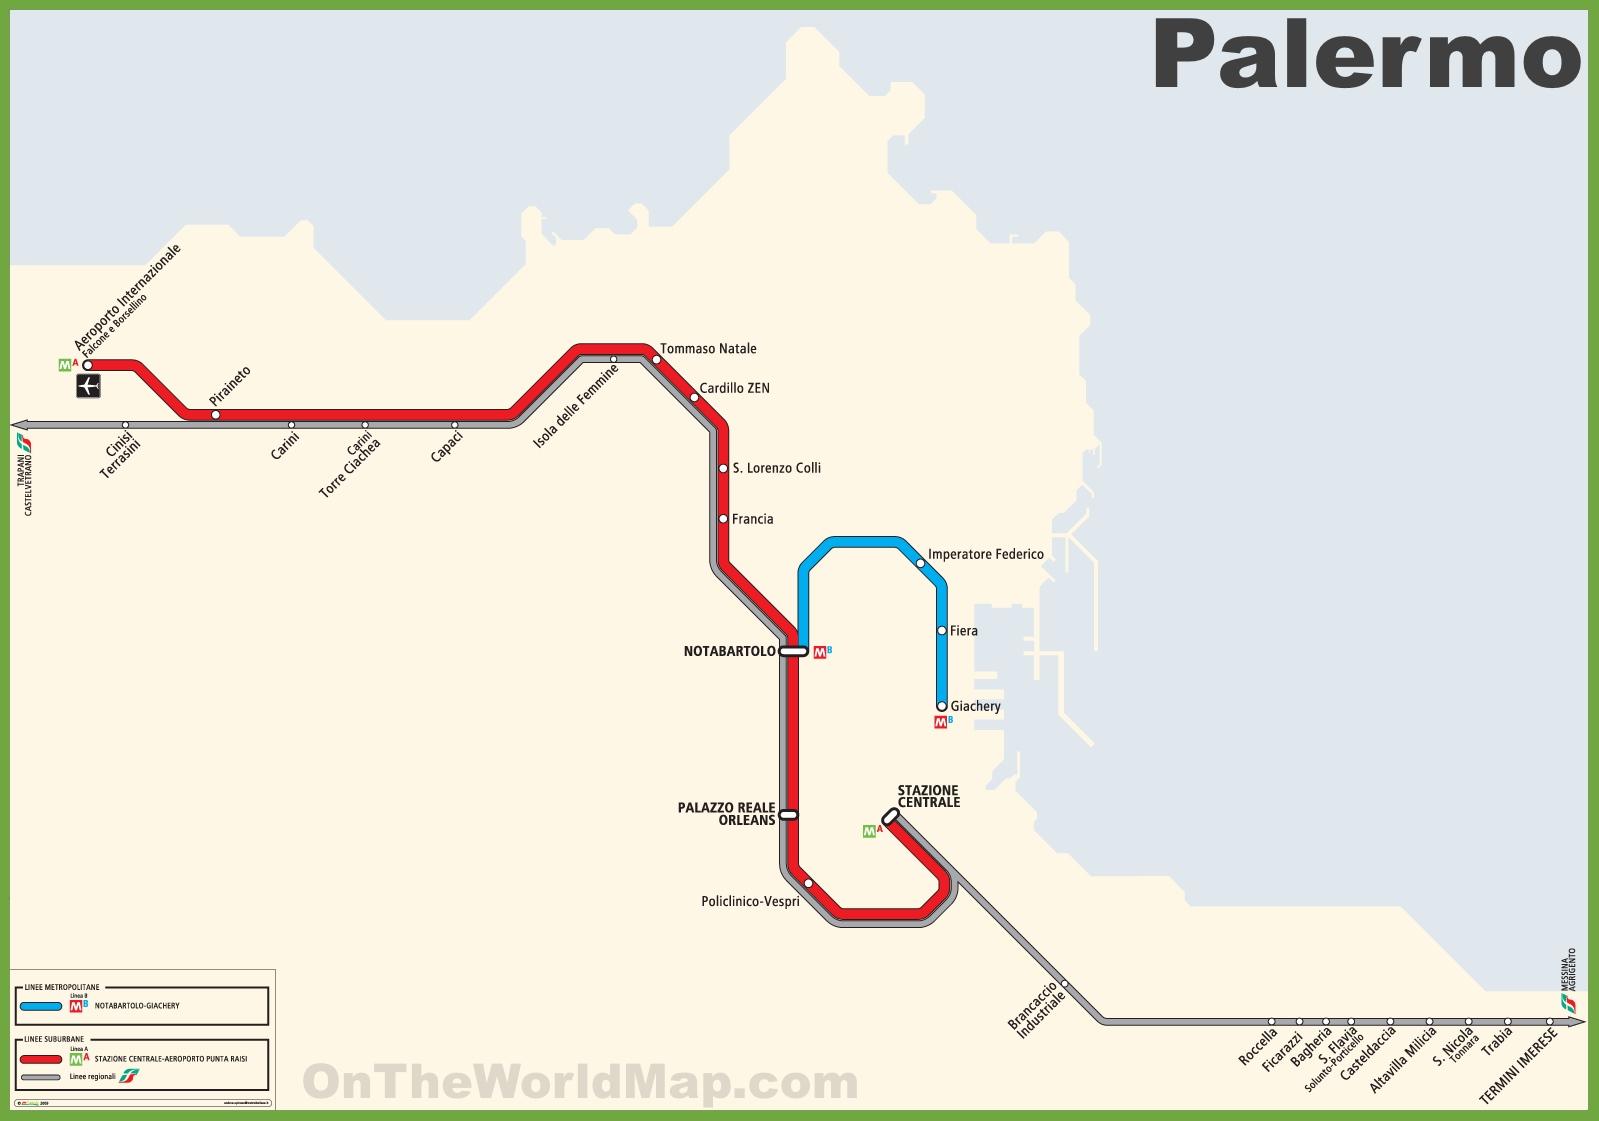 Palermo metro map